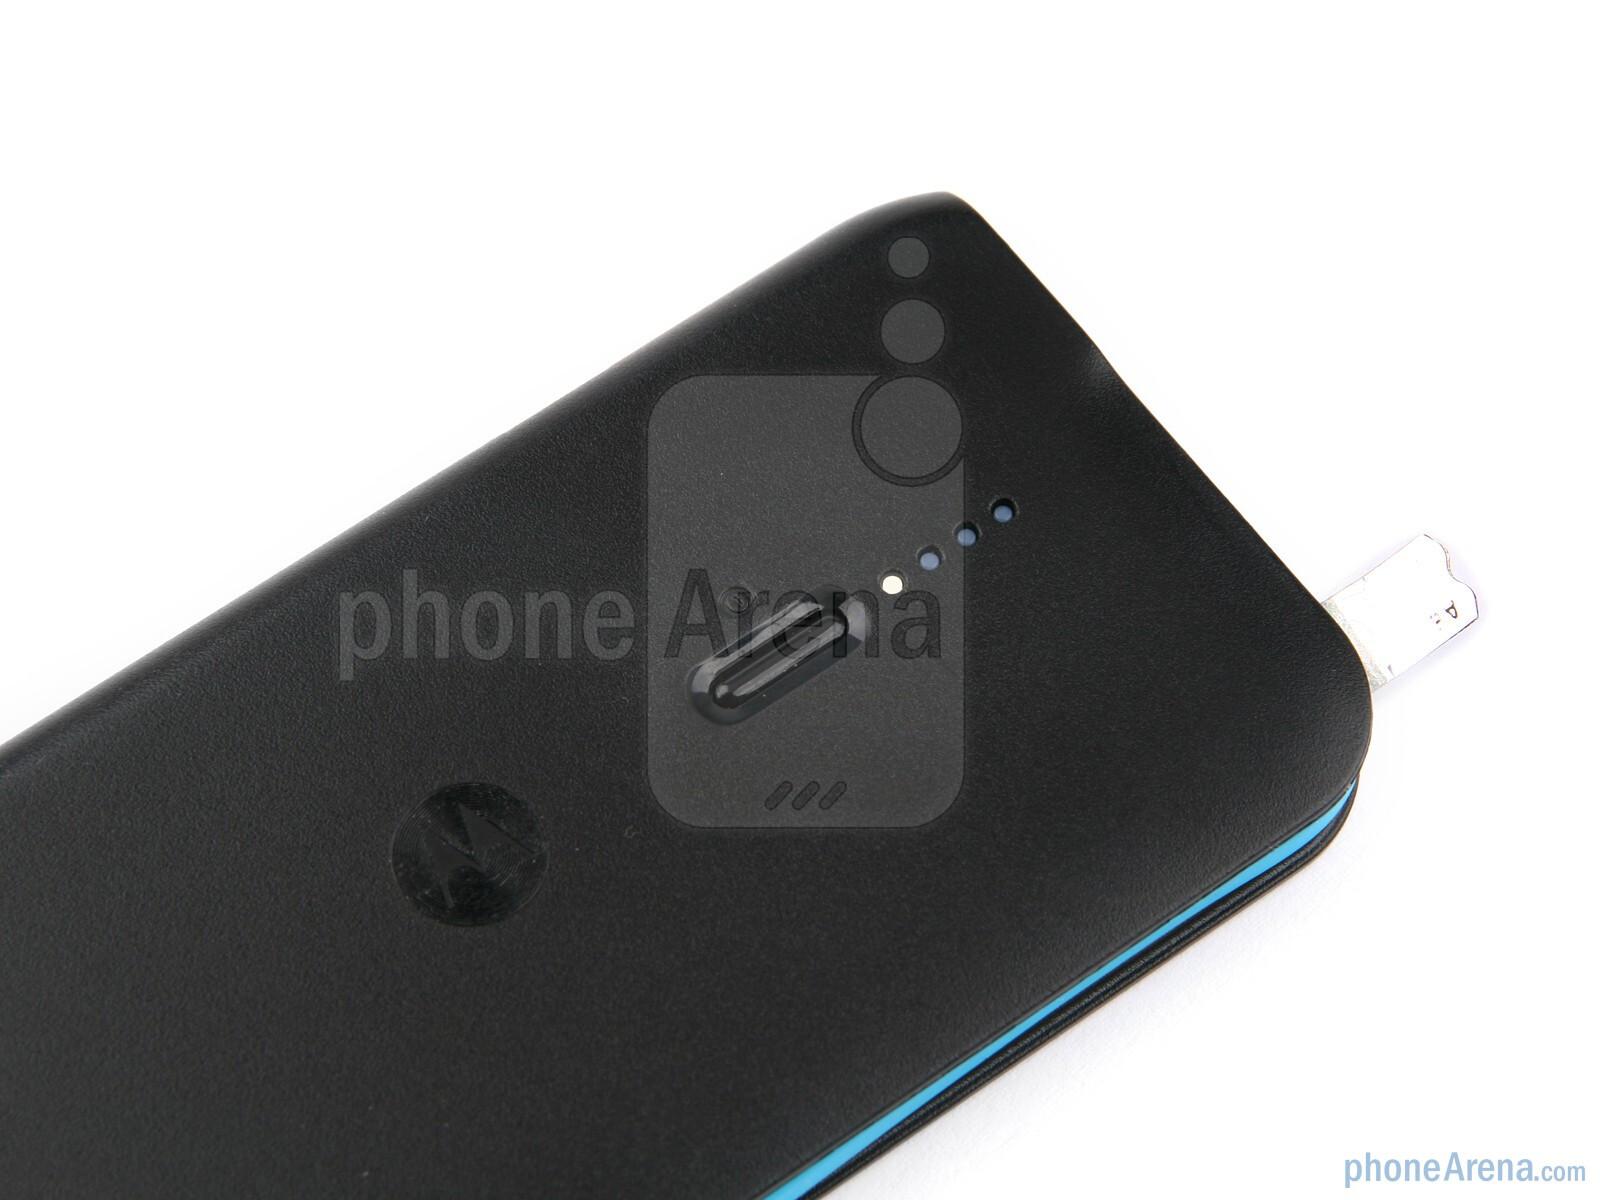 Motorola P793 Universal Usb Portable Power Pack Review